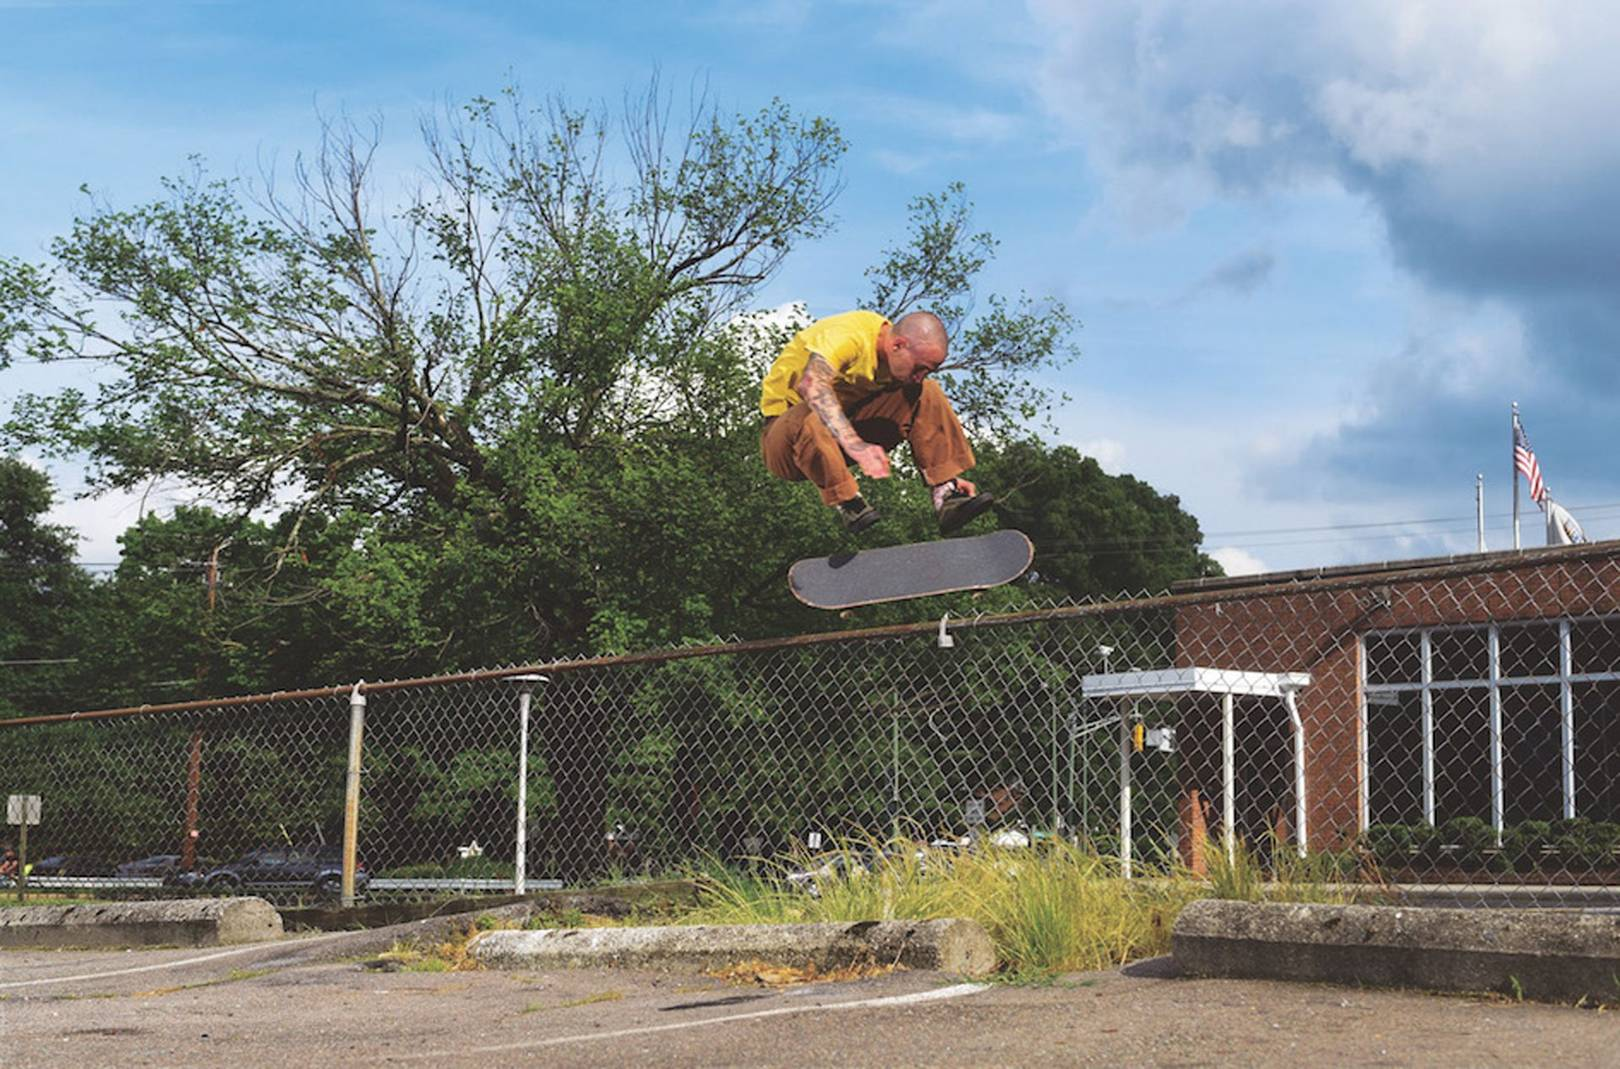 6a0d05807d0 Skateboard blog: the GQ guide to shredding | British GQ